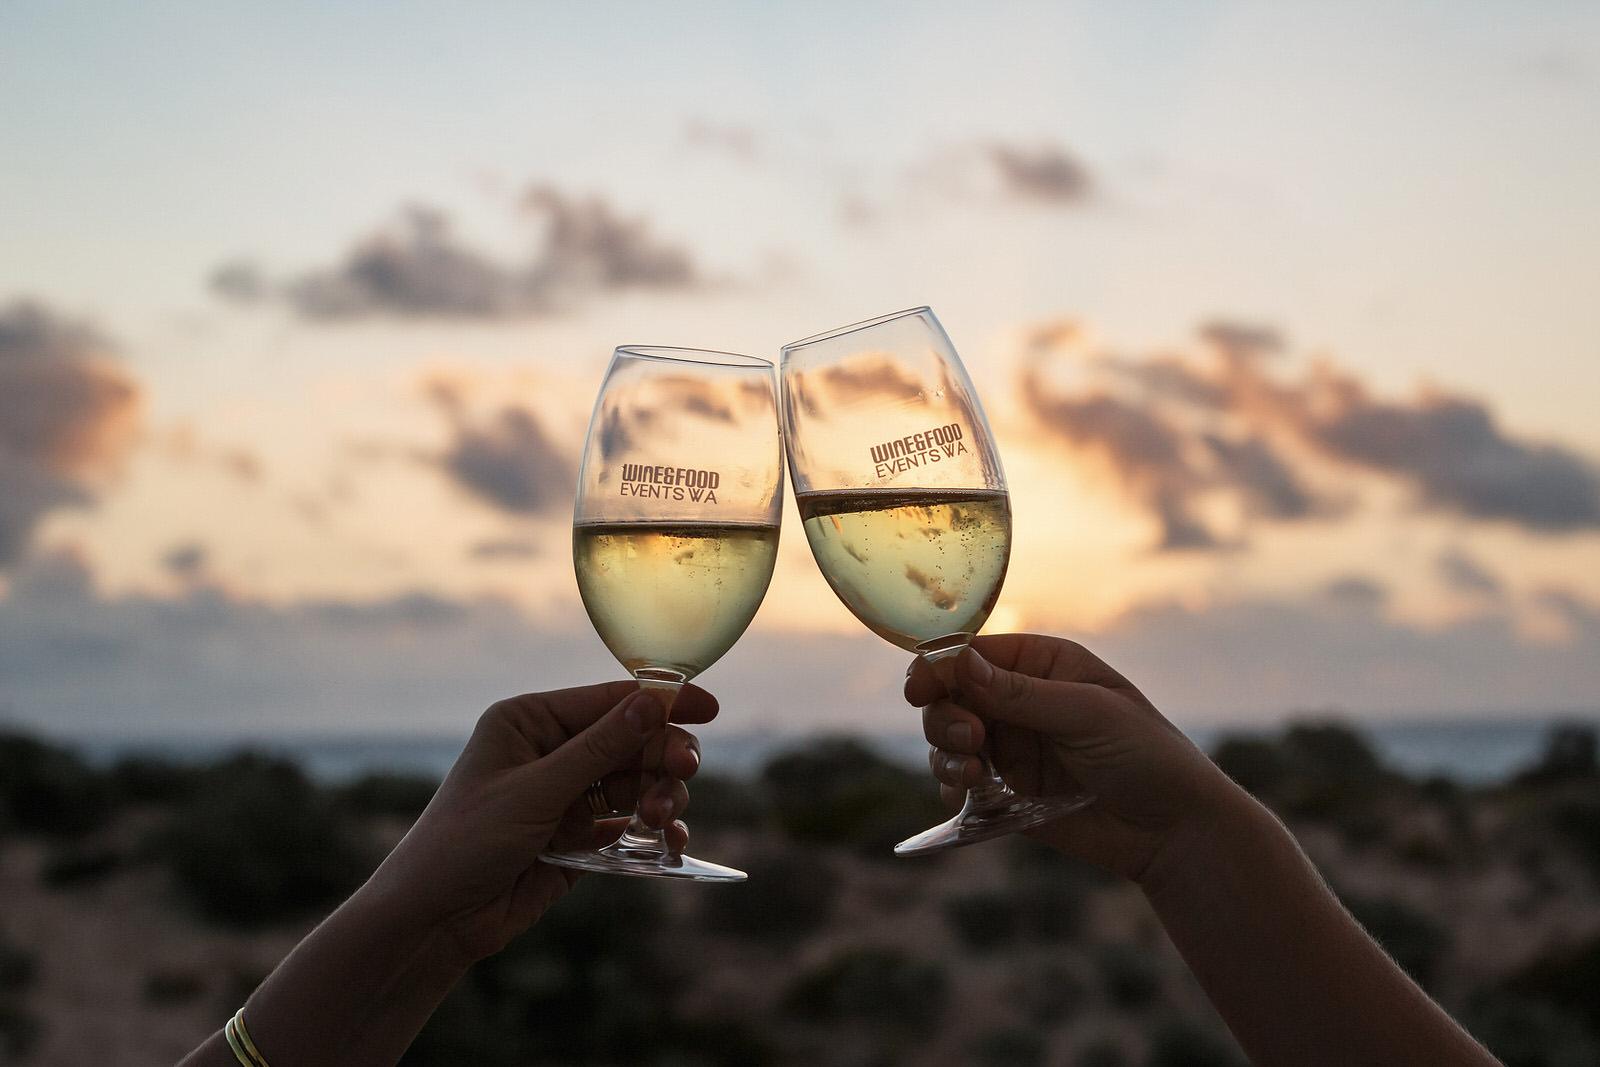 20180217-CMS-Sunset_Wine-Feb18-0845-1.jpg